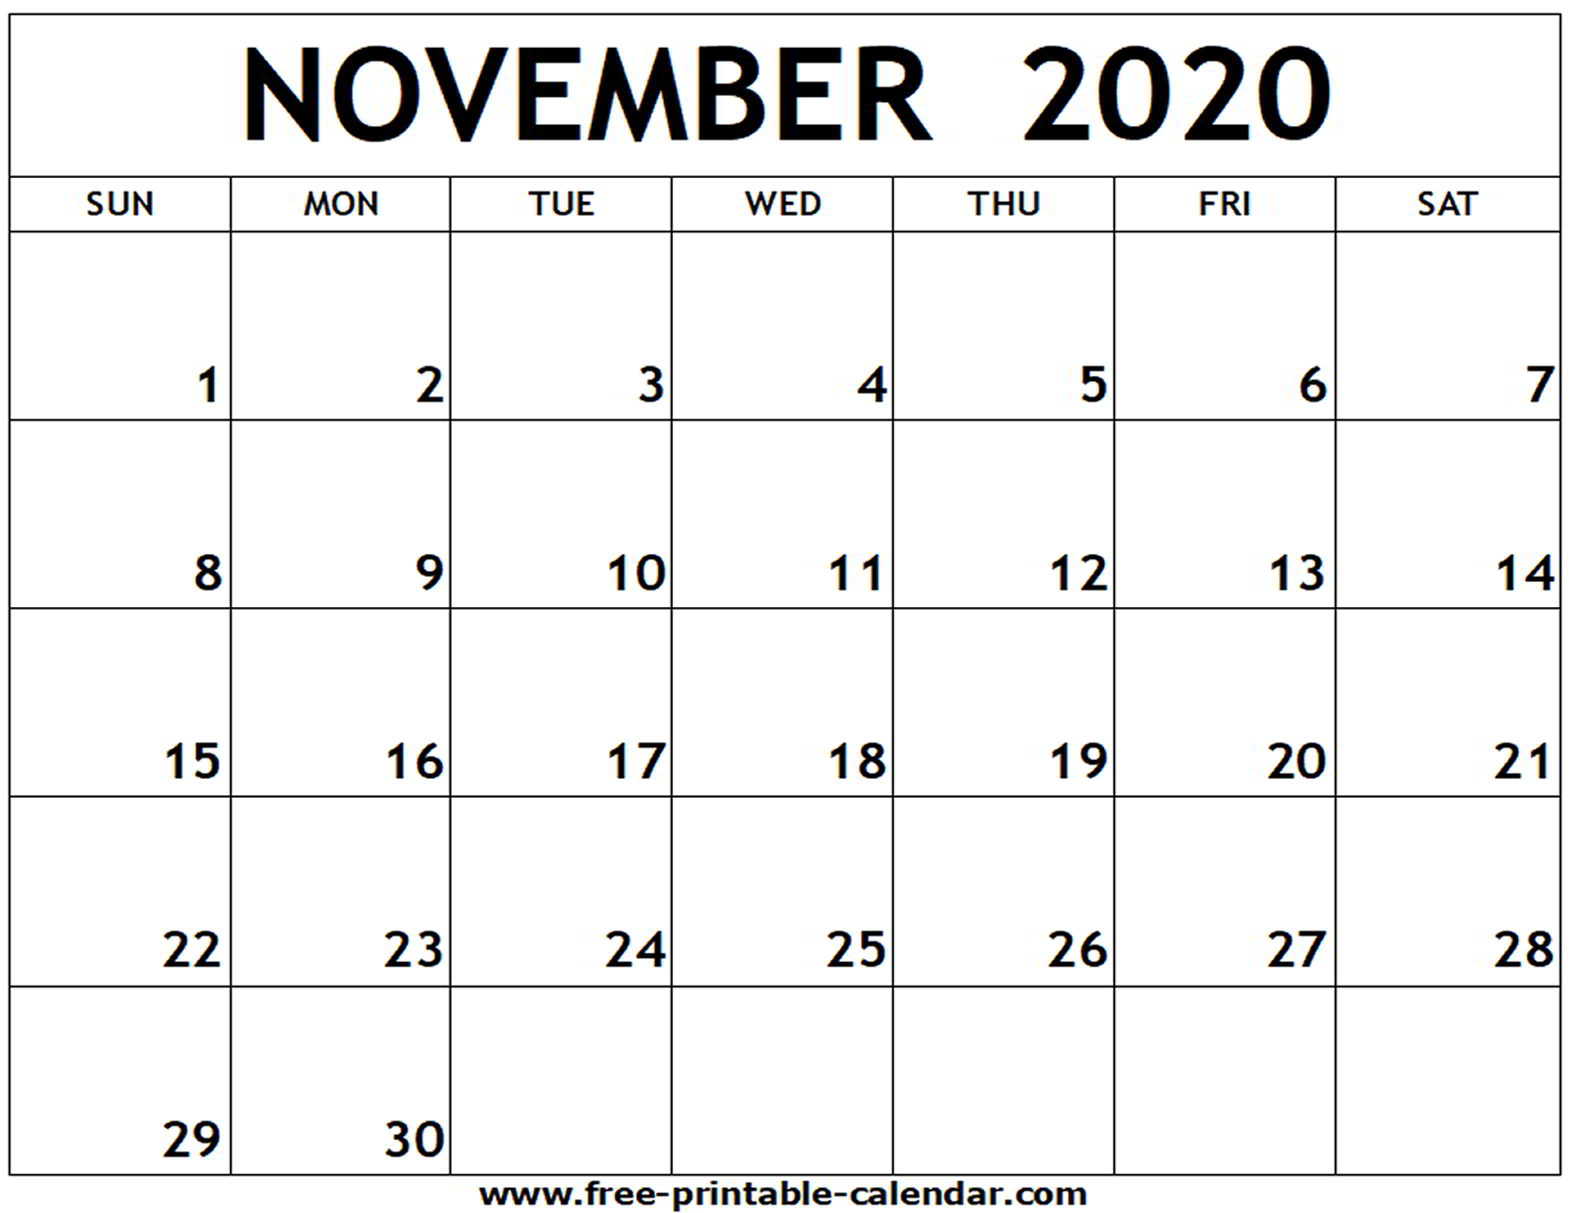 November 2020 Printable Calendar - Free-Printable-Calendar within Free Fill In Calendars 2020